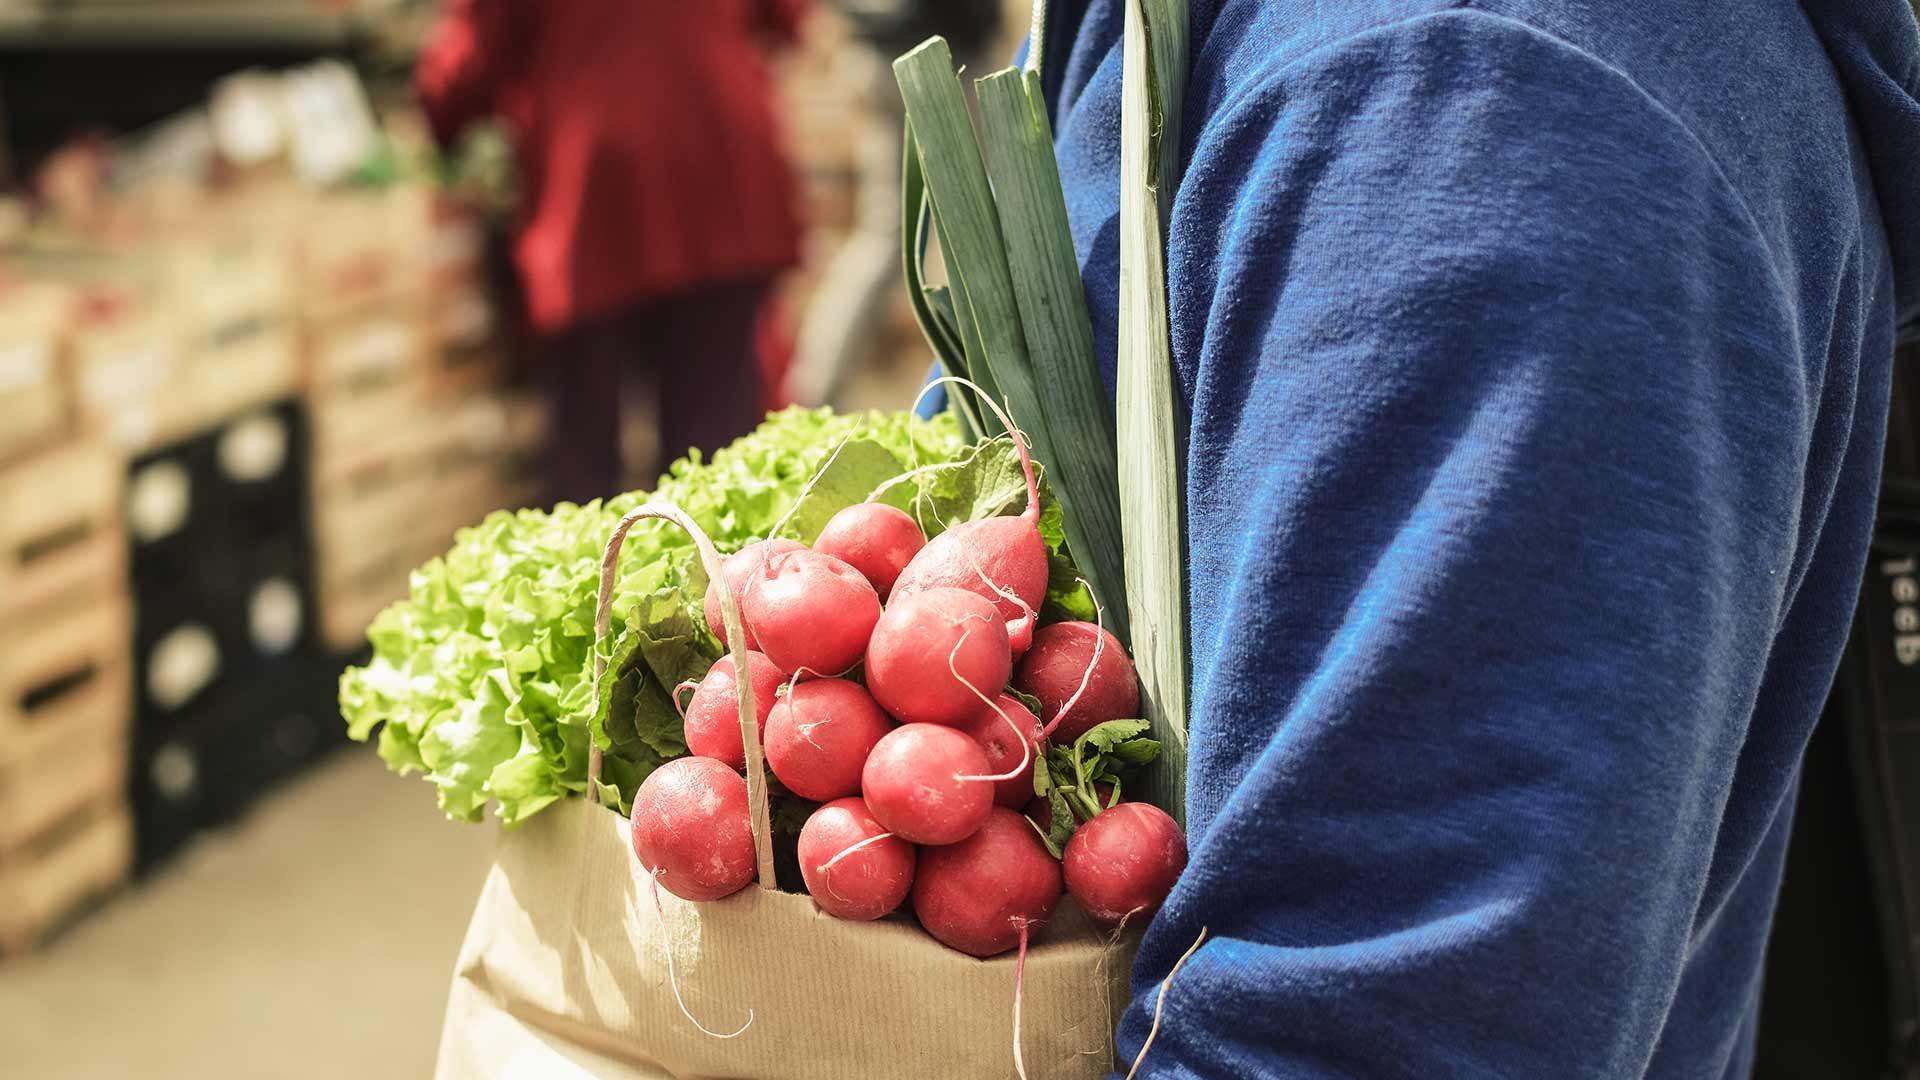 Mercato contadino a S. Valburga